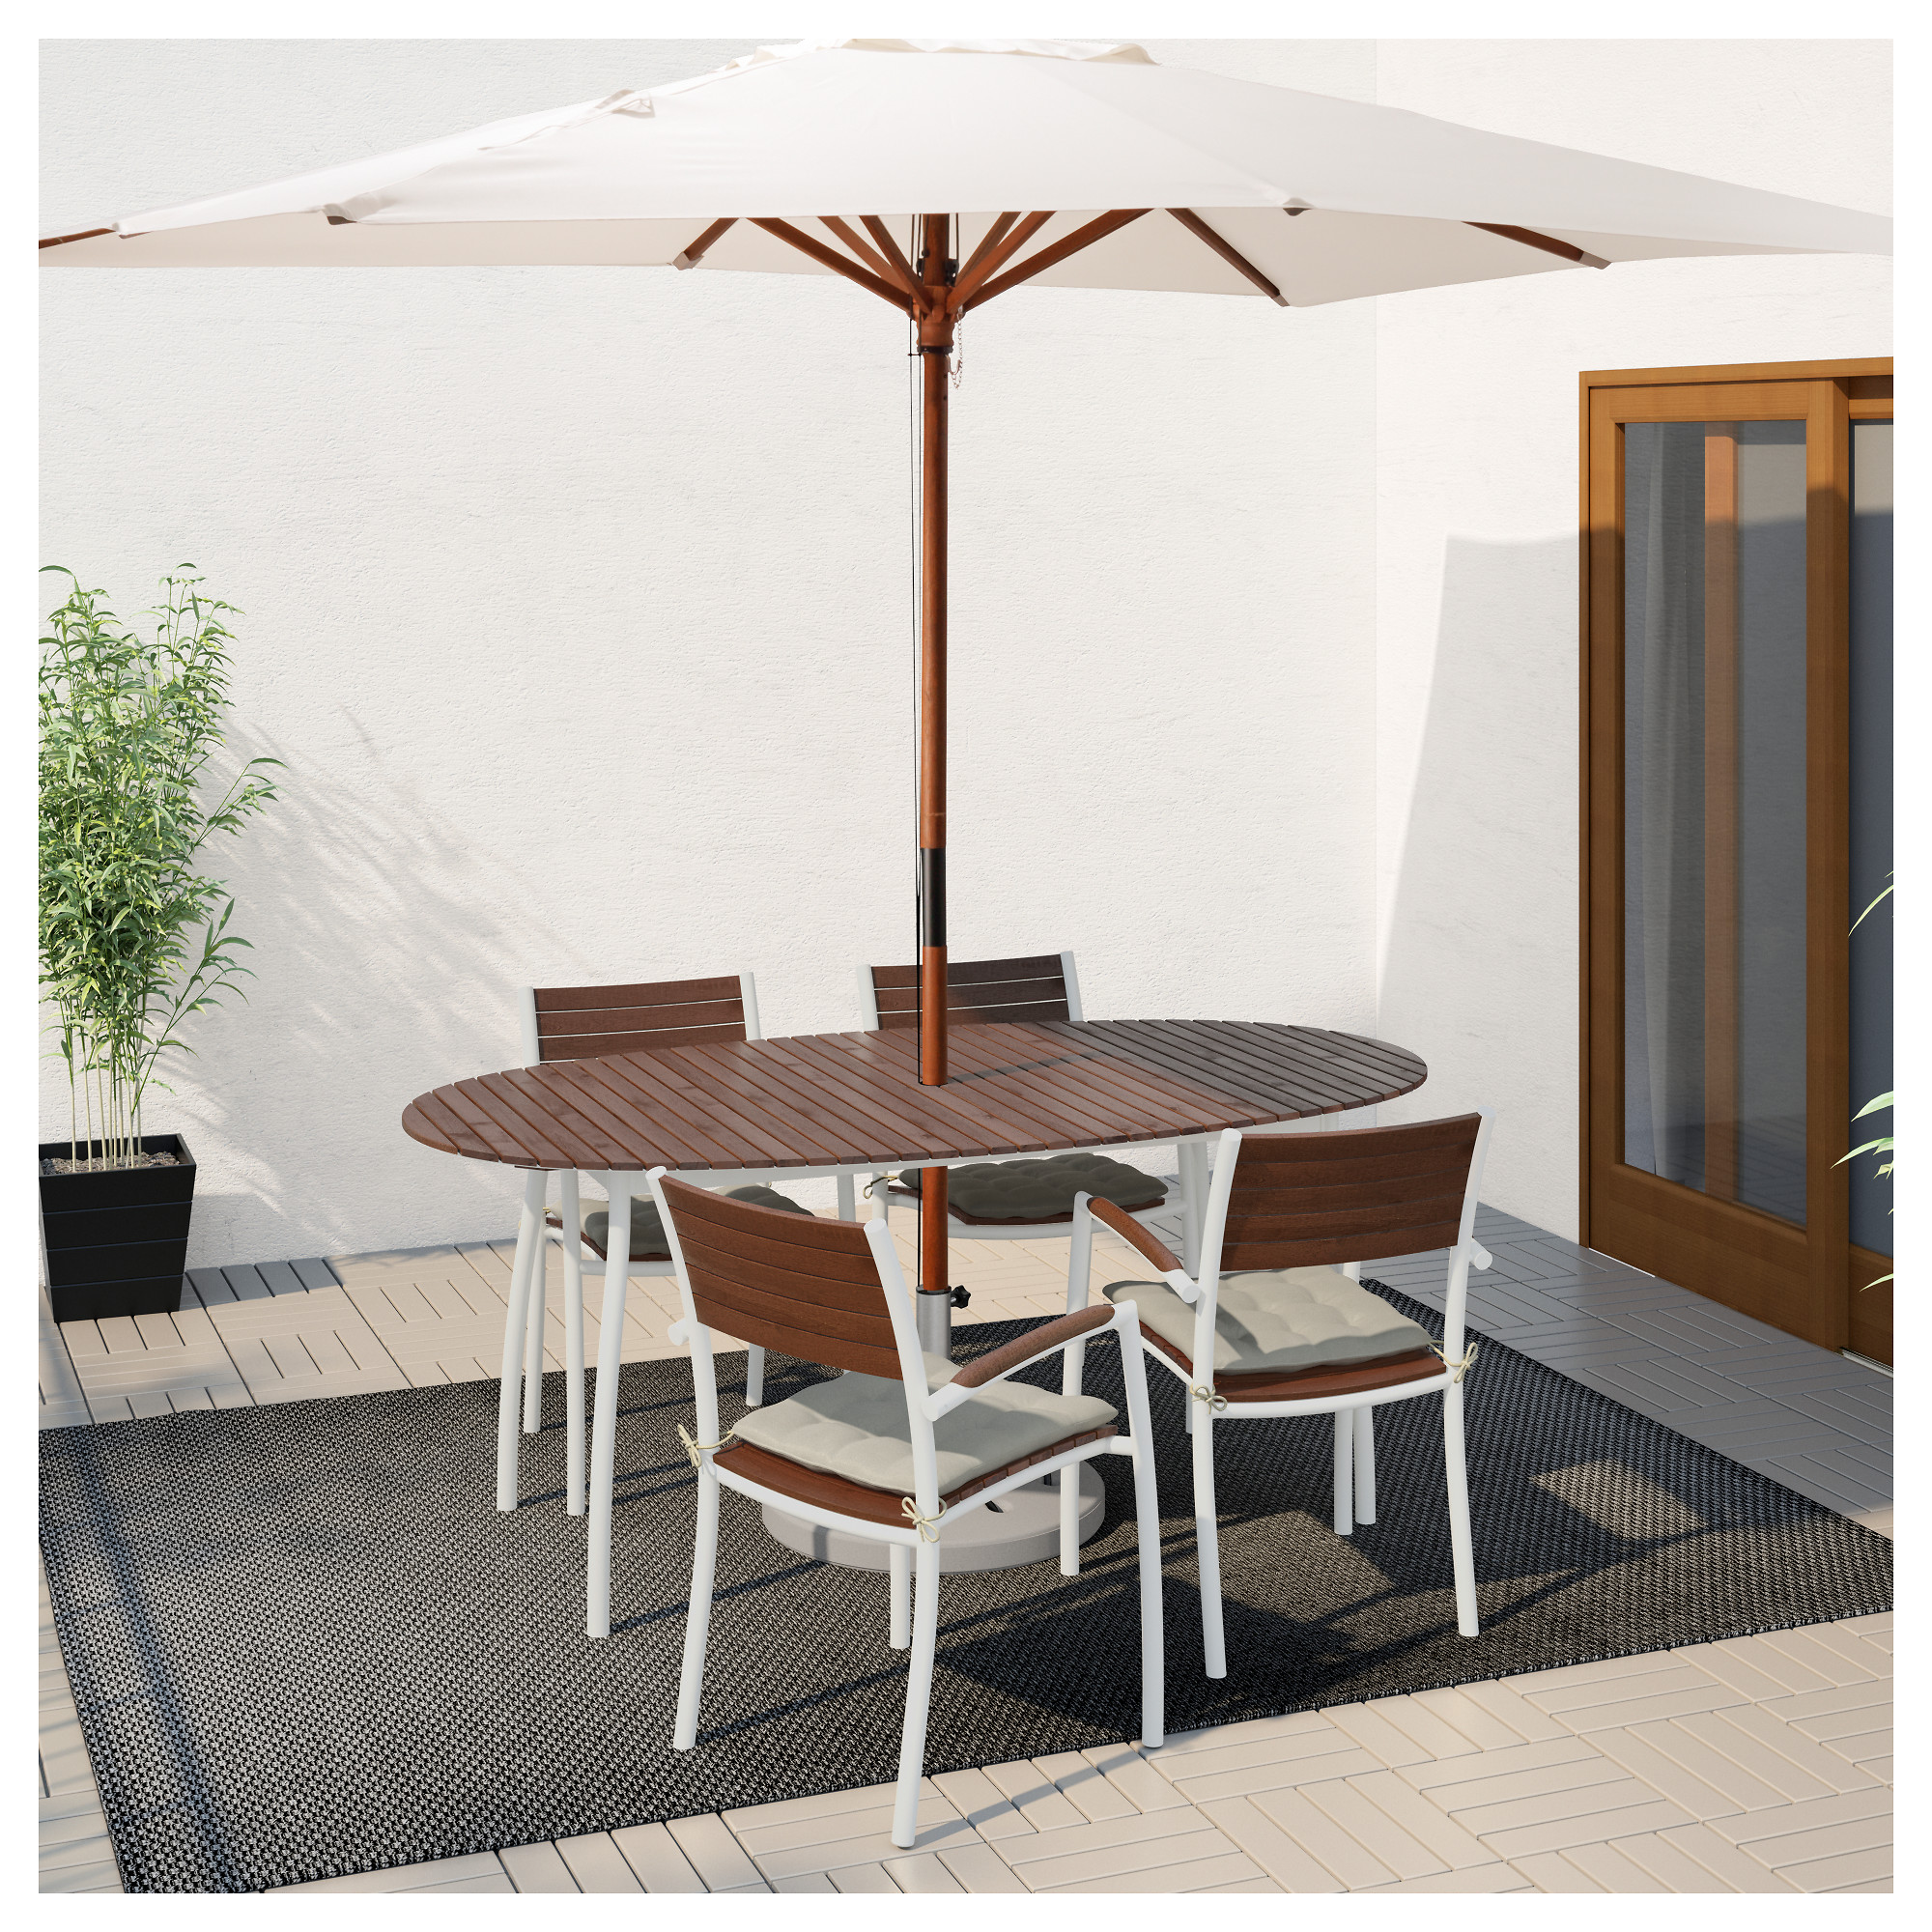 VINDALSÖ Outdoor Dining Tables, IKEA